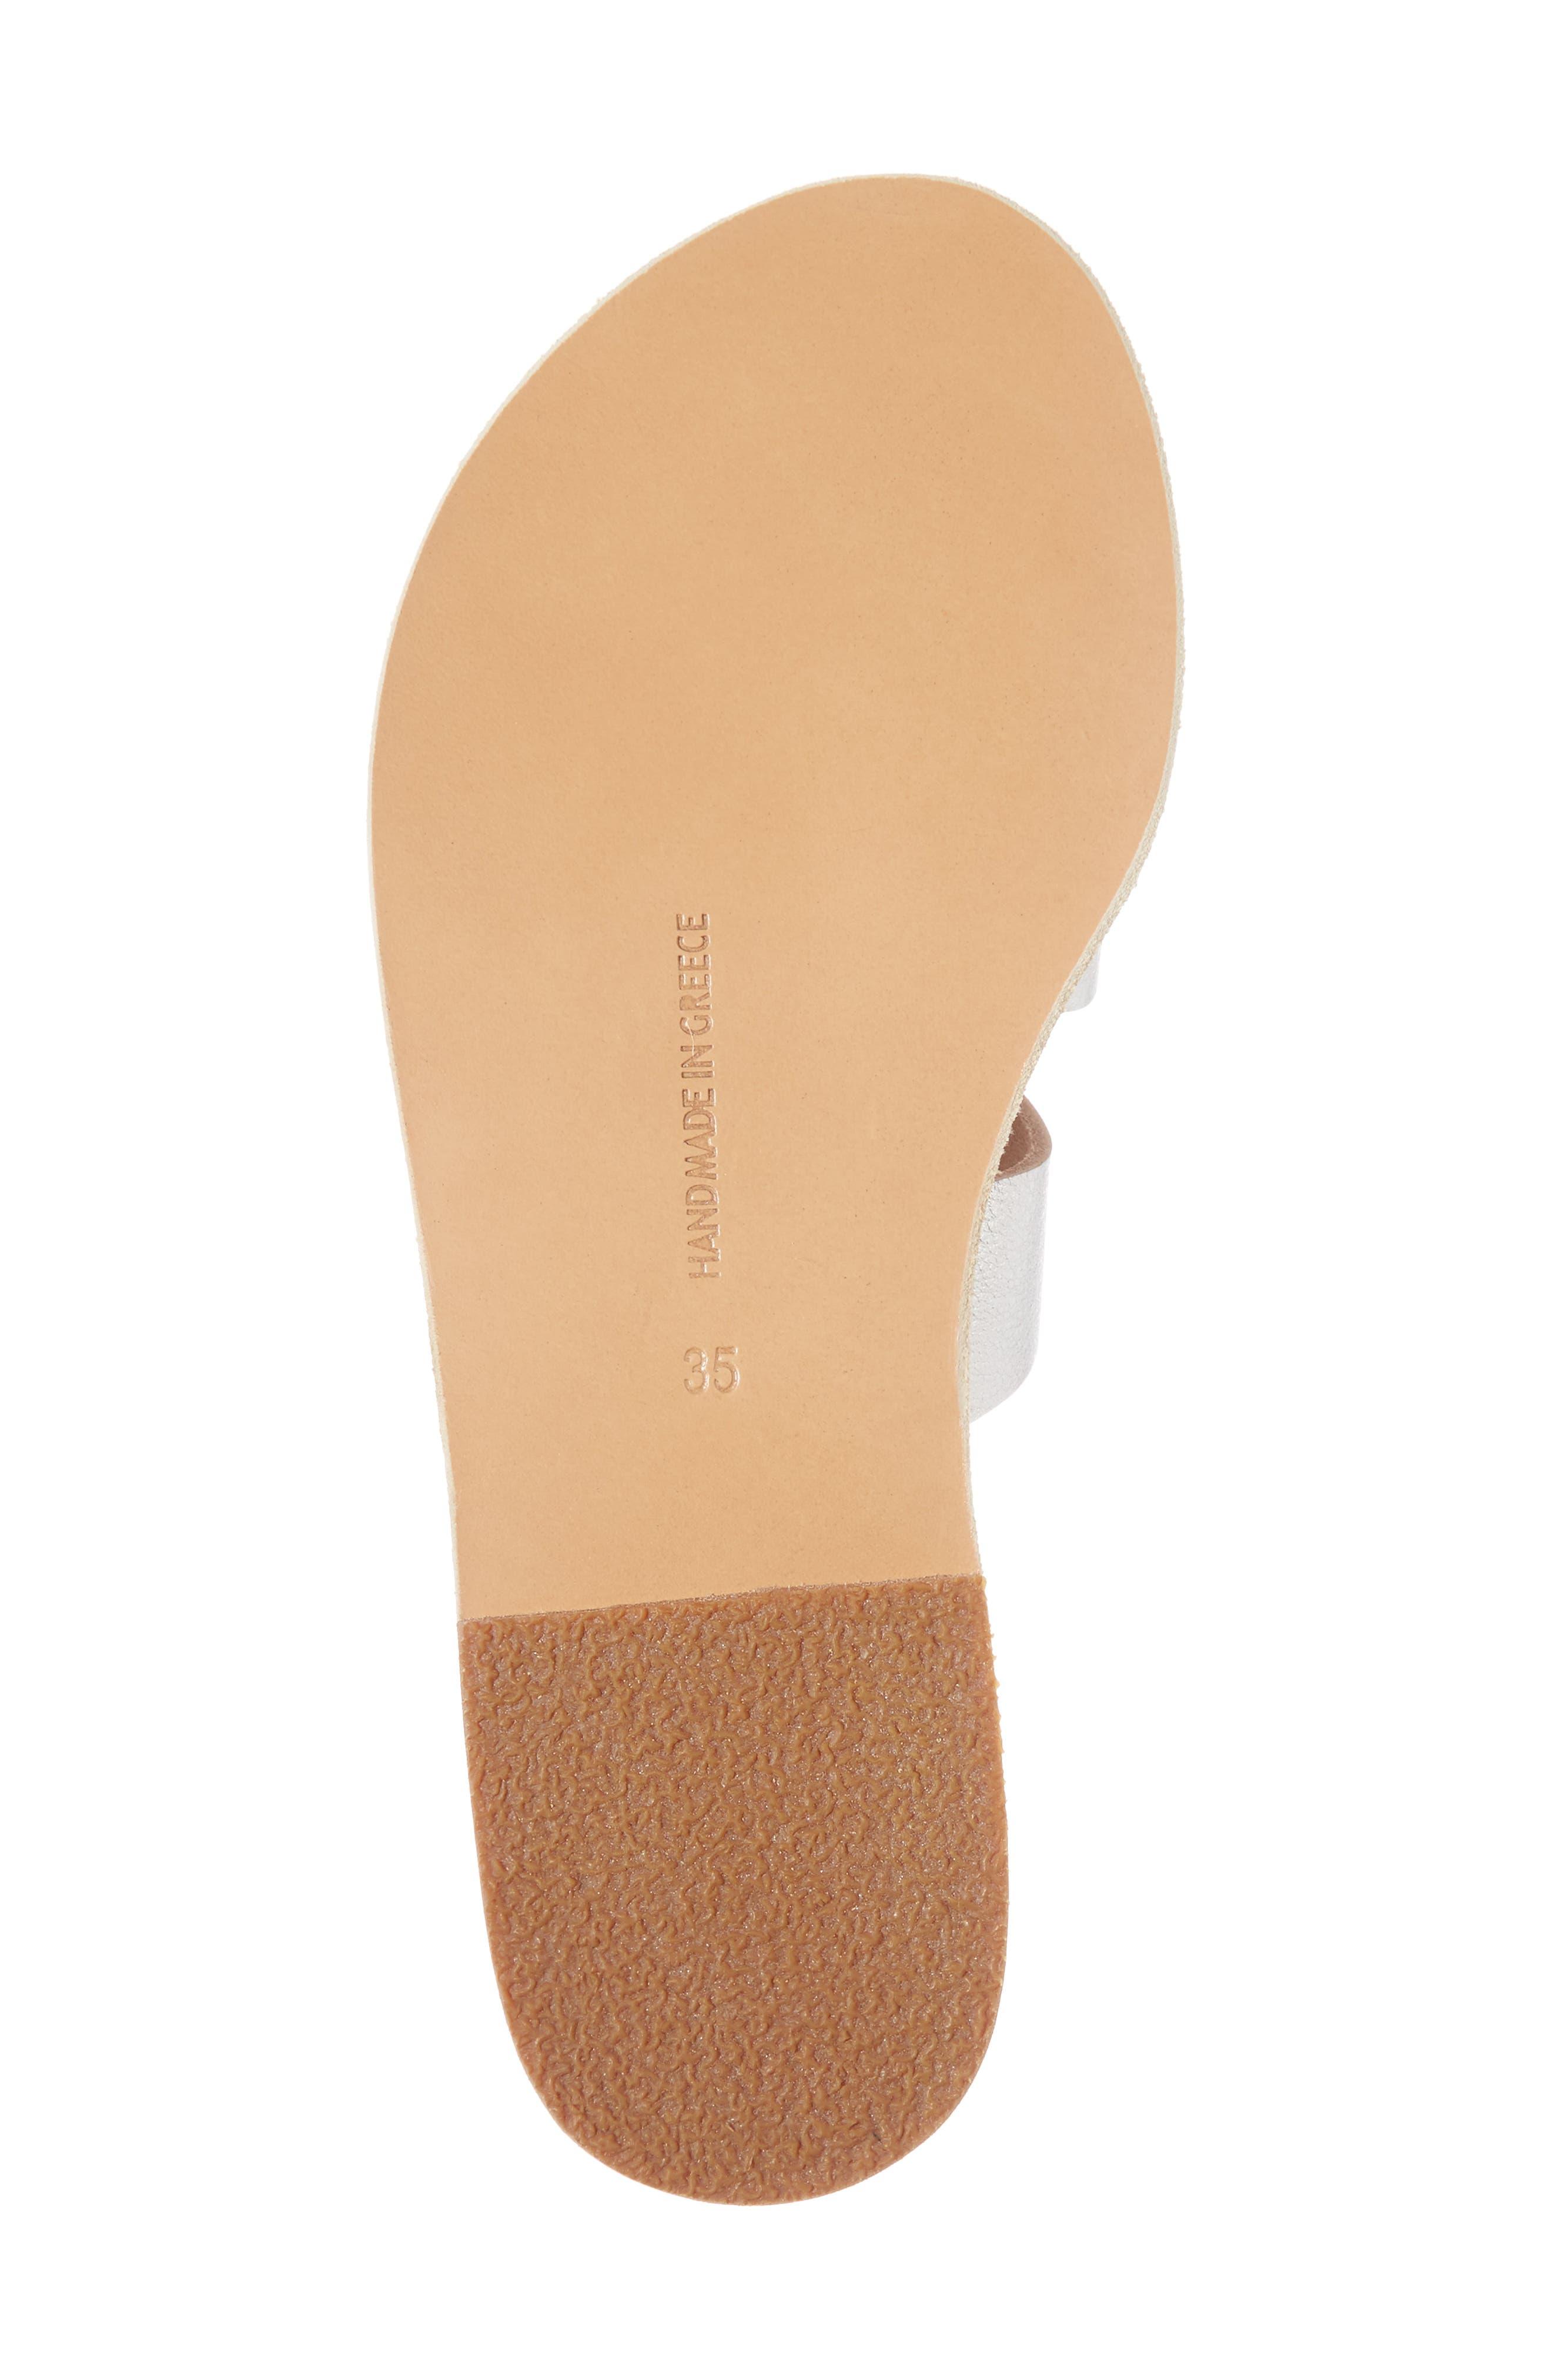 Apteros Slide Sandal,                             Alternate thumbnail 6, color,                             METAL SILVER